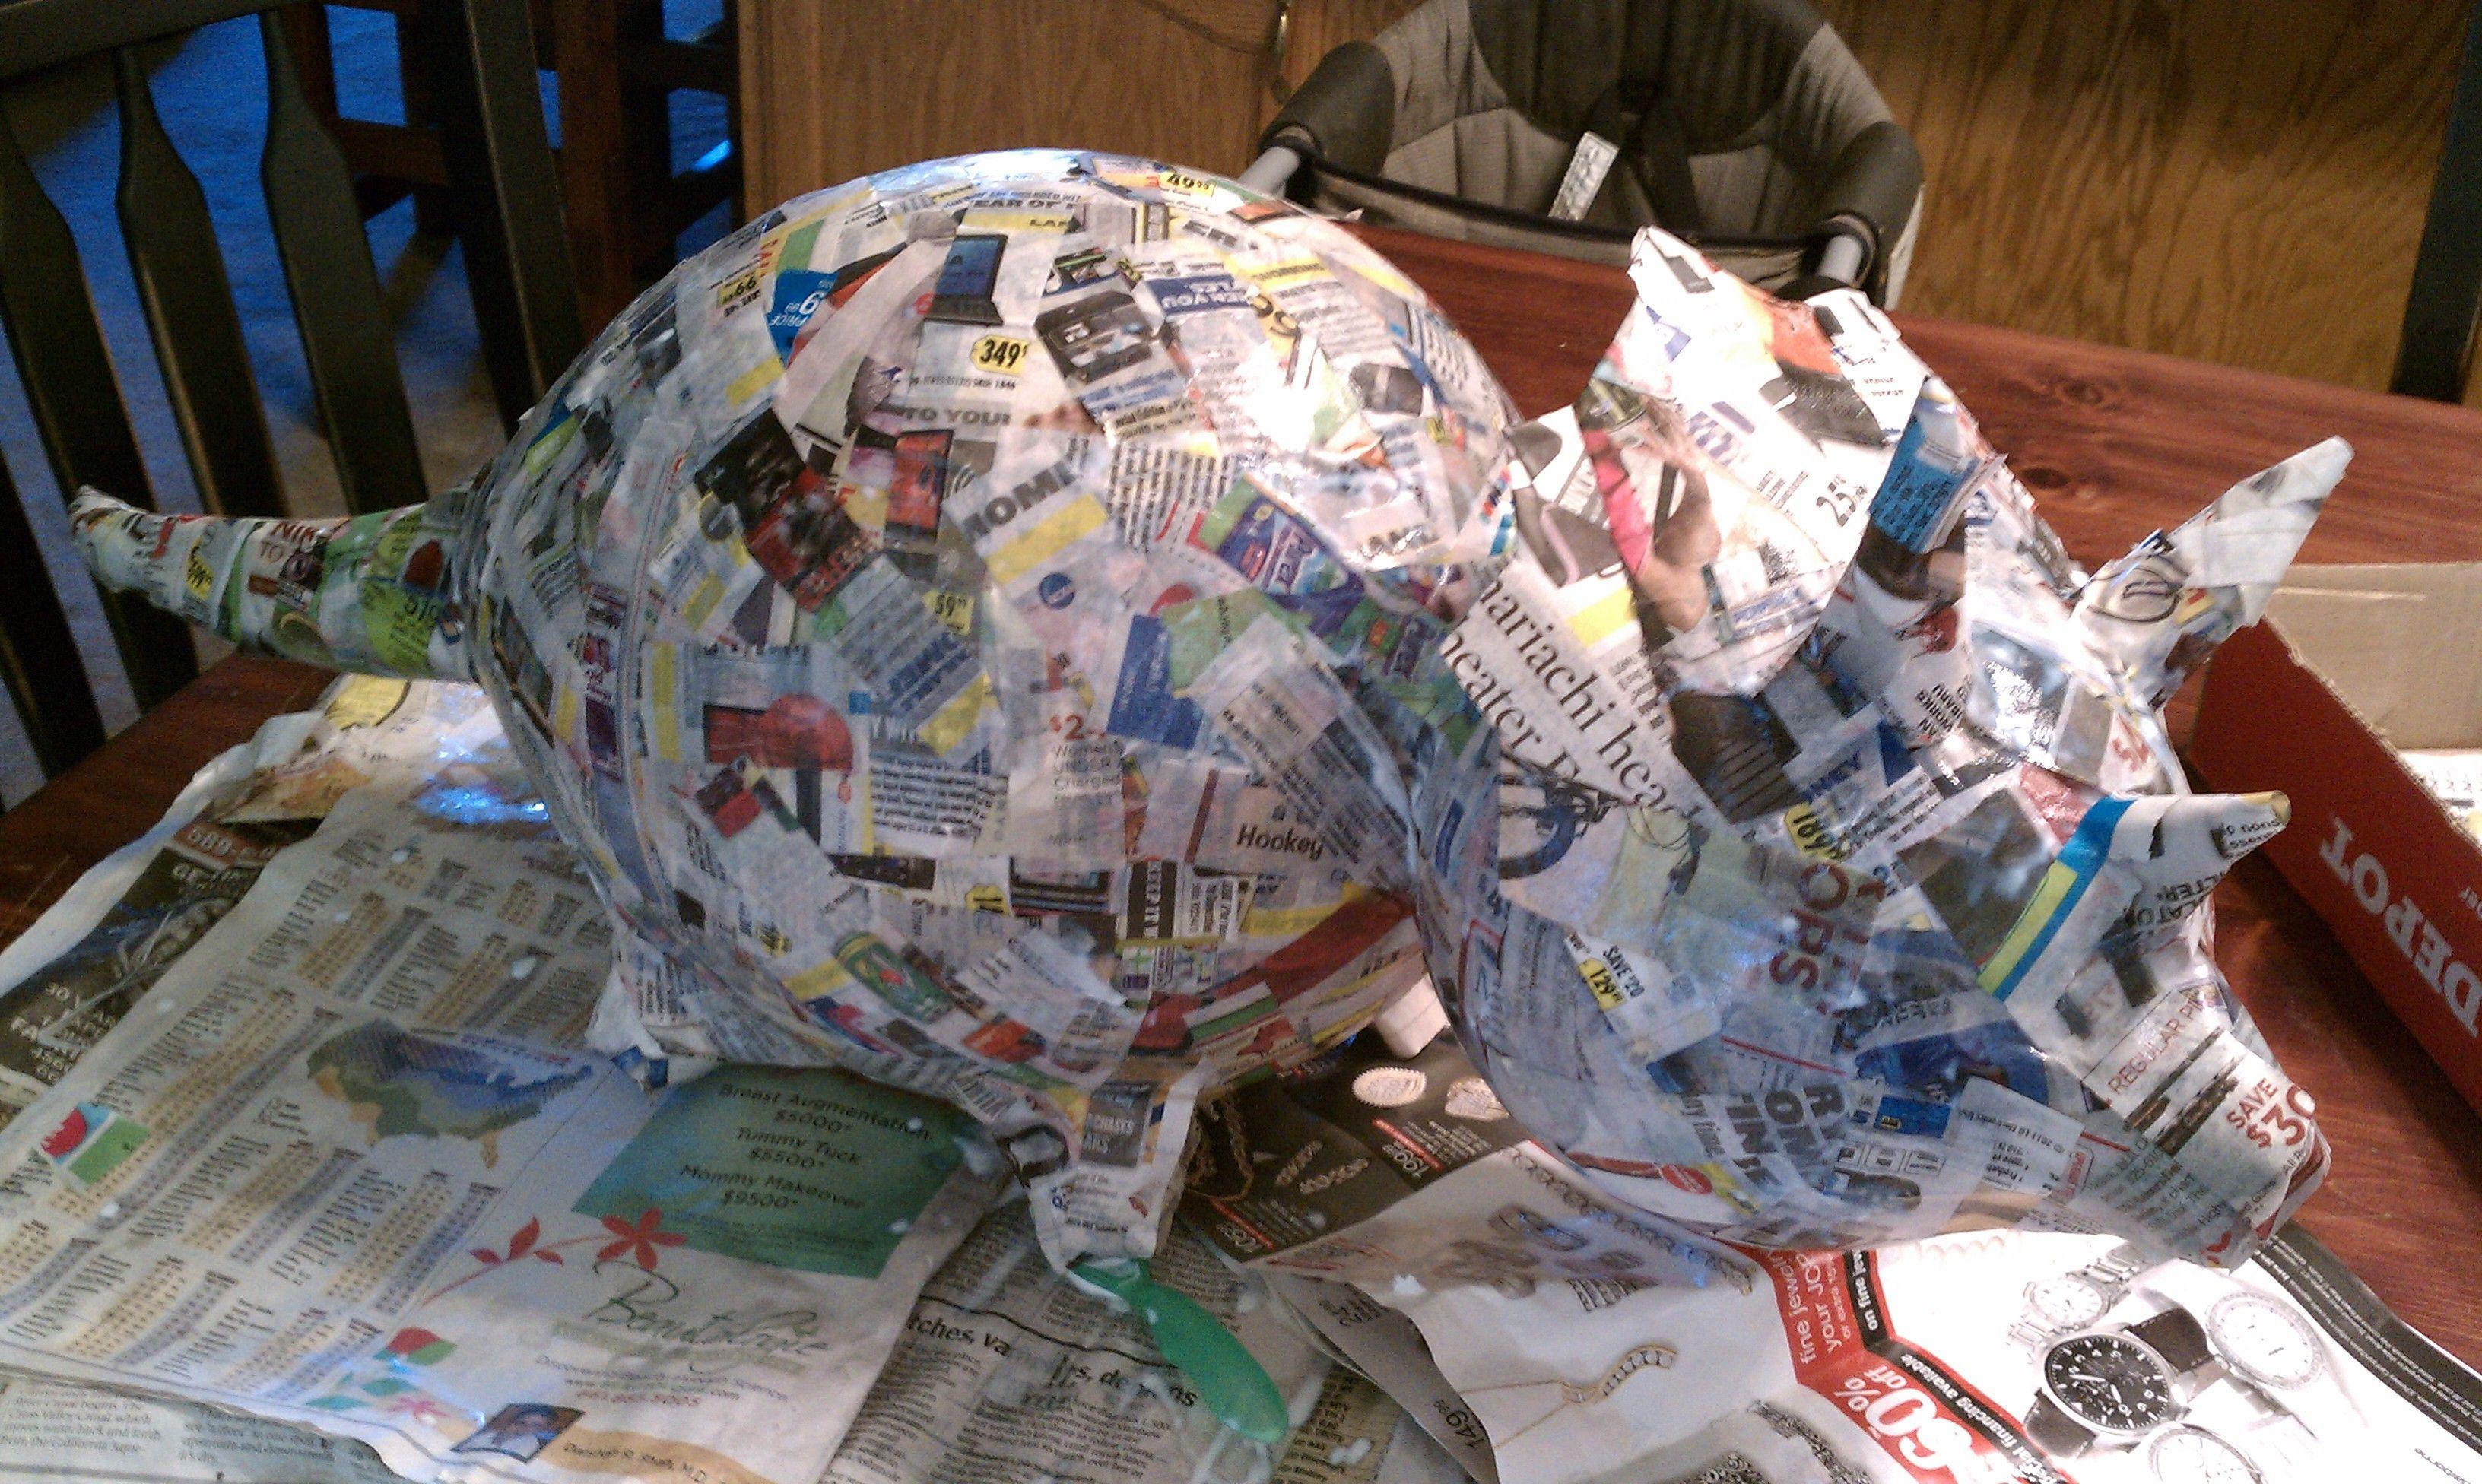 Pin De Arclene Praxedes En I Make Decoracion De Dinosaurios Fiestas Fiesta De Cumpleaños De Dinosaurio Dinosaurios Para Niños